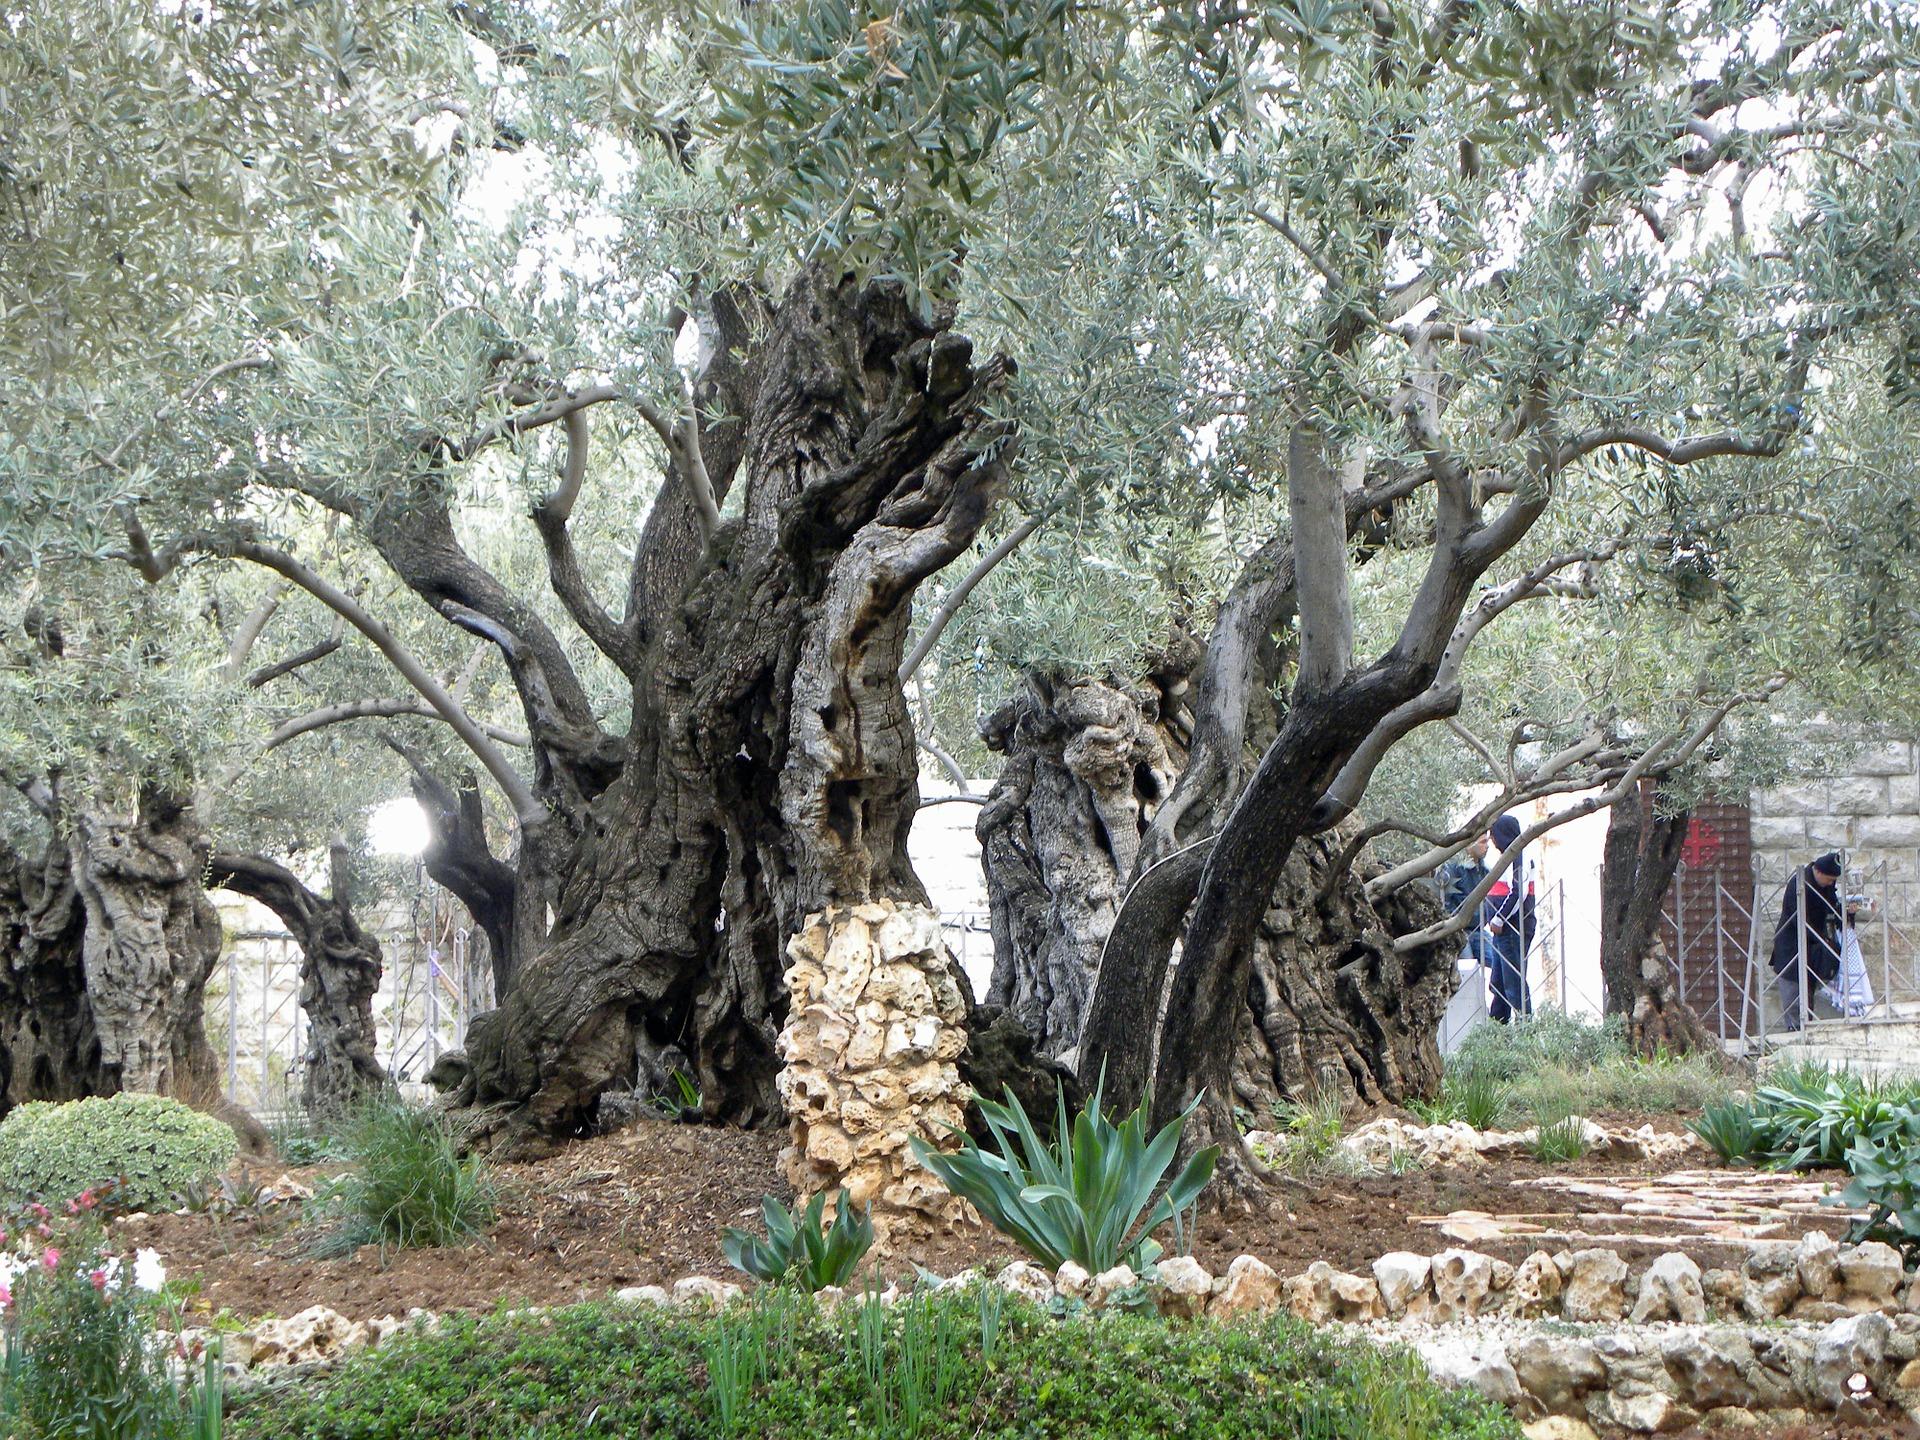 gethsemane-556051_1920.jpg